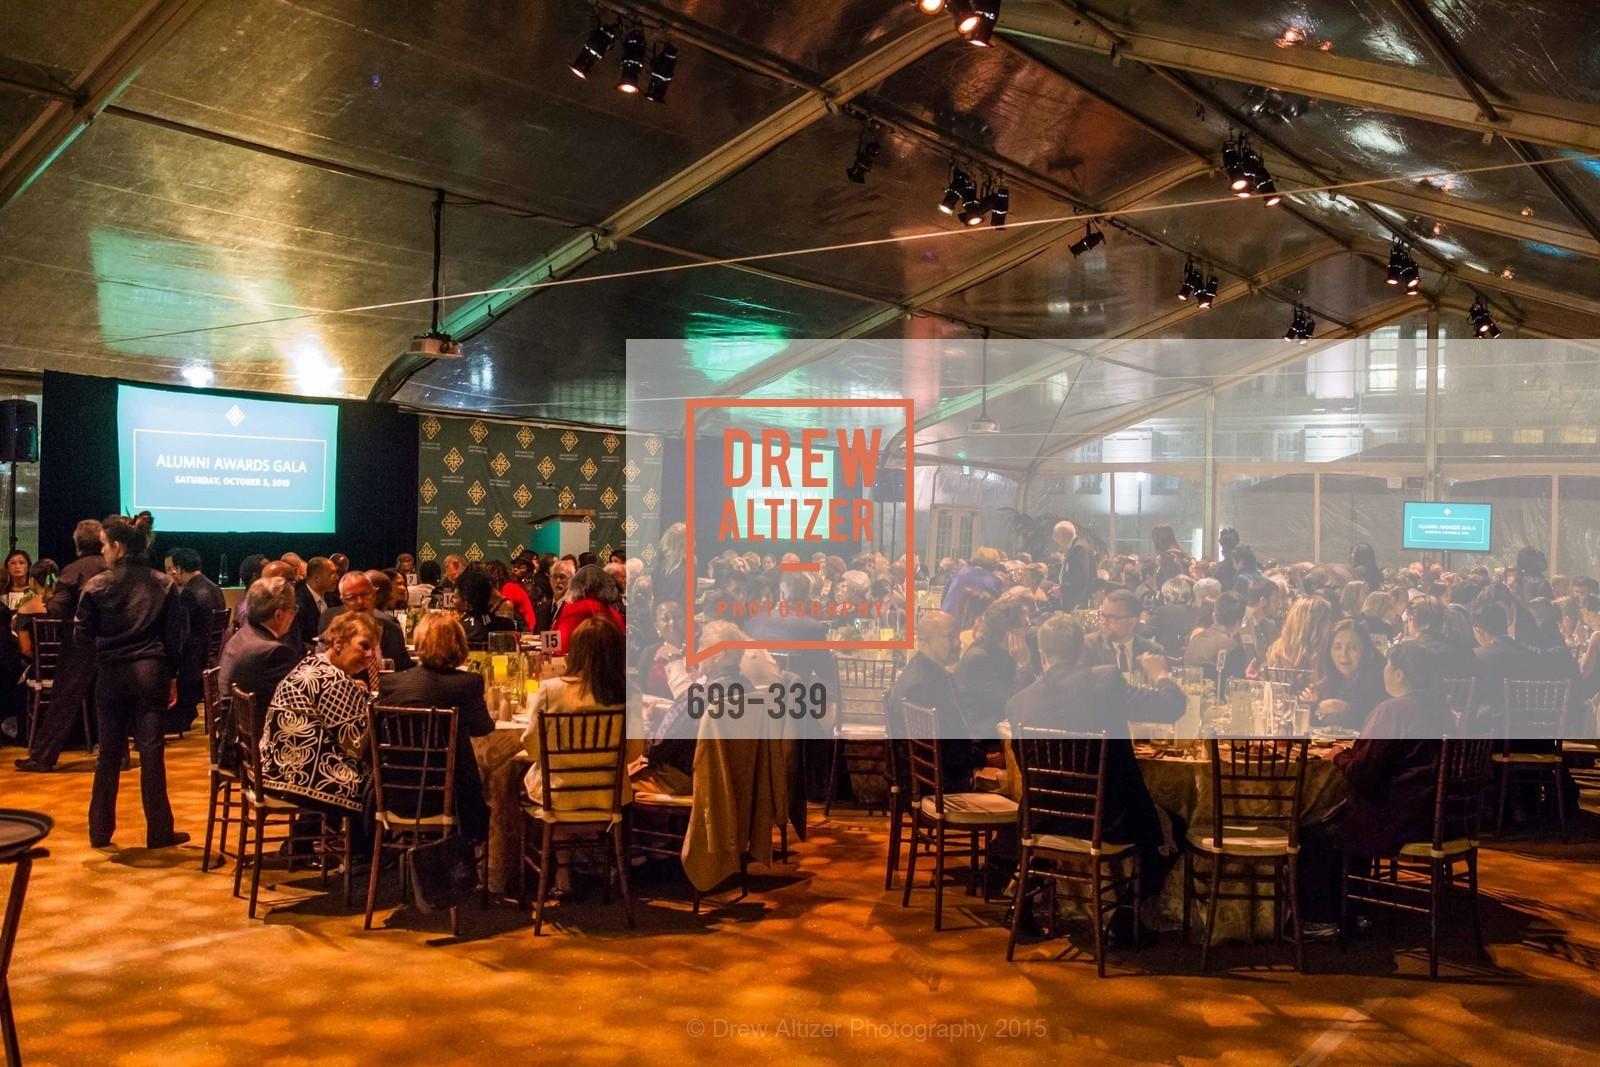 Atmosphere, University of San Francisco Alumni Awards Gala 2015, University of San Francisco, October 2nd, 2015,Drew Altizer, Drew Altizer Photography, full-service agency, private events, San Francisco photographer, photographer california